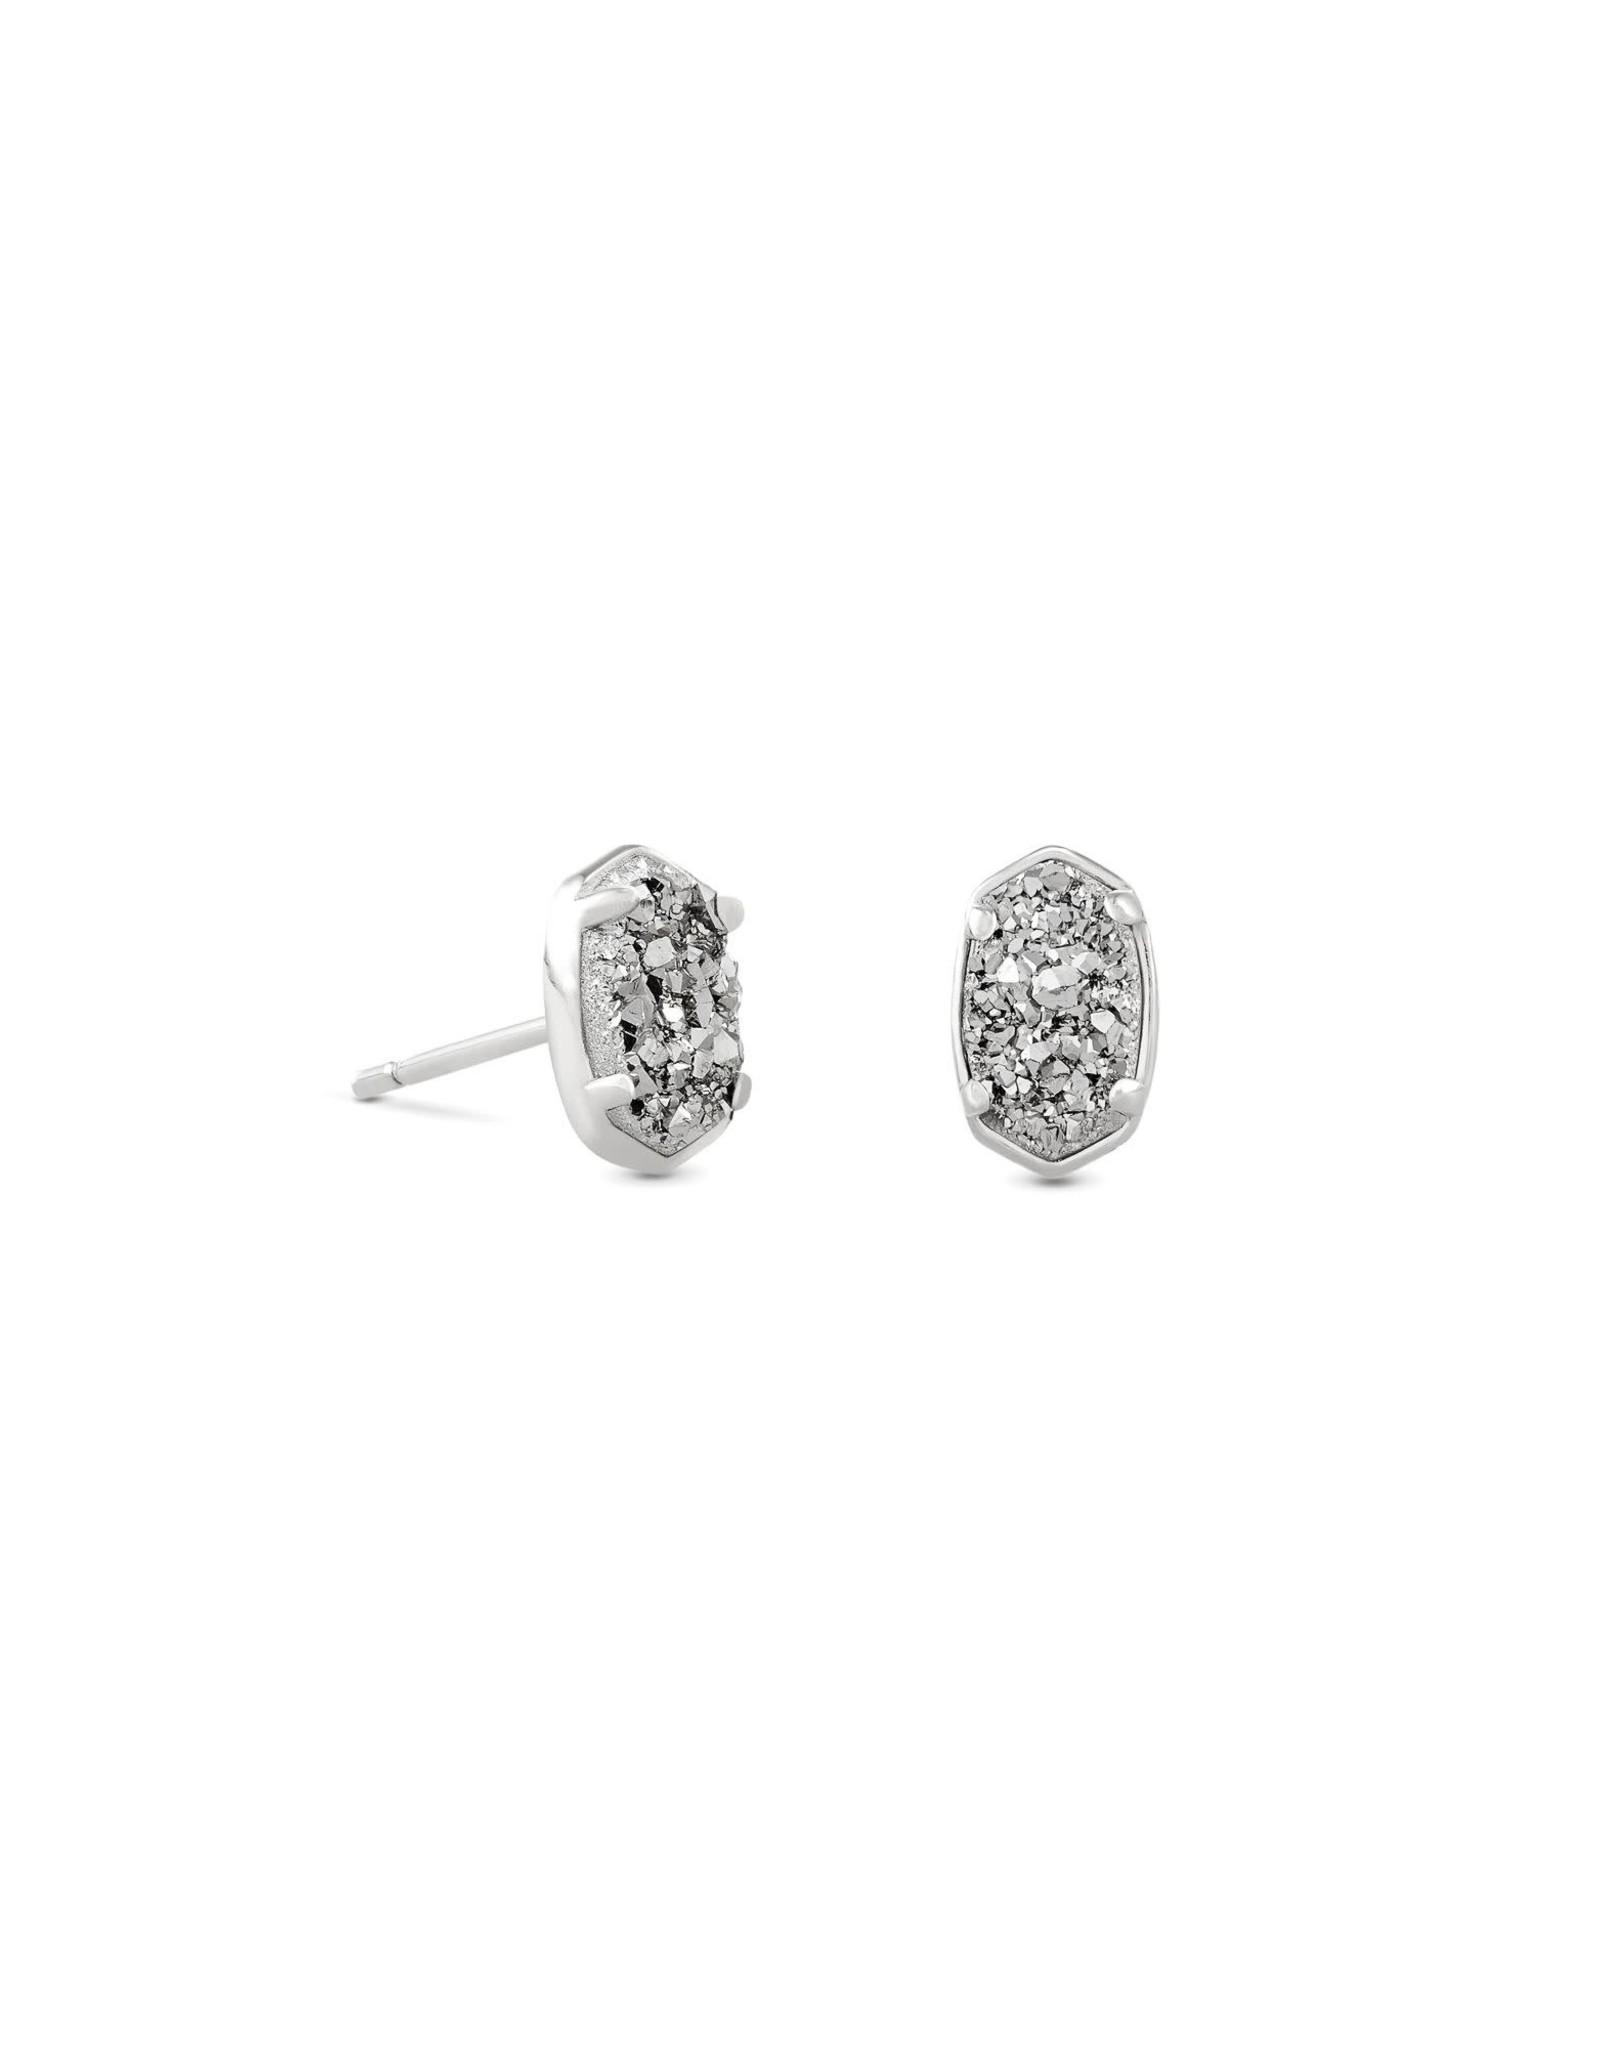 Kendra Scott Emilie Stud Earring - Platinum Drusy/Rhodium